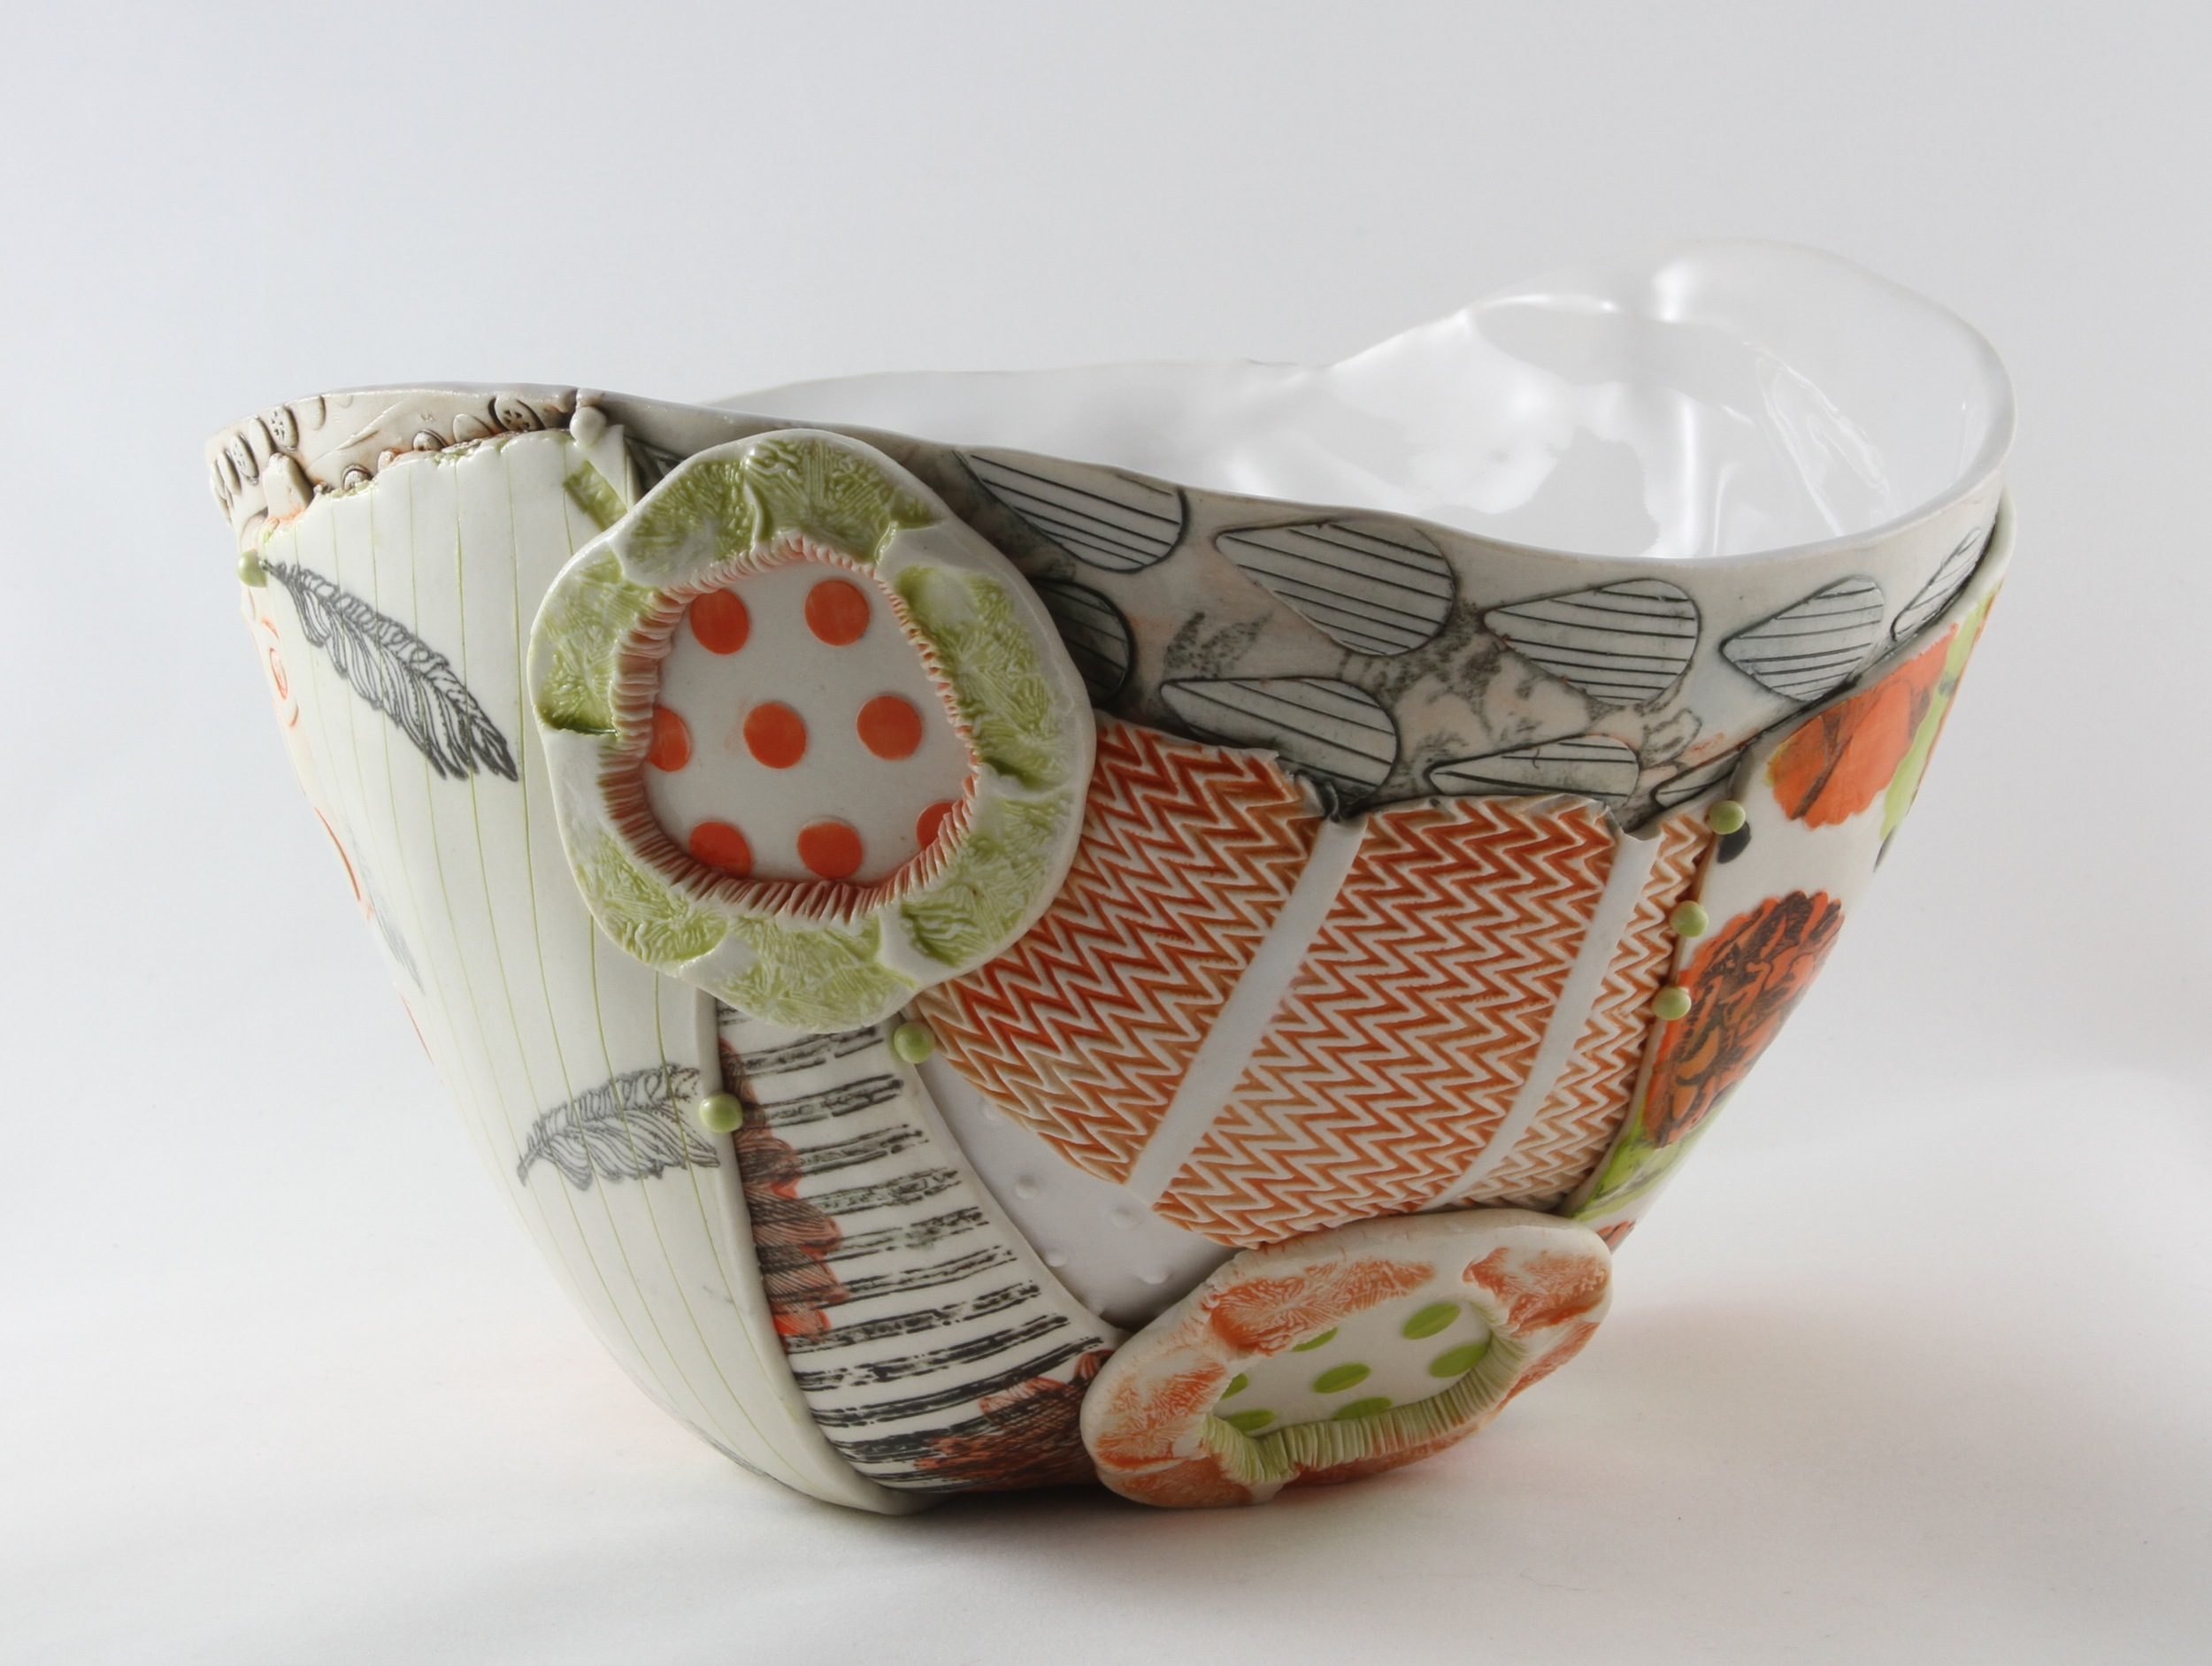 Marney McDiarmid, Ceramic